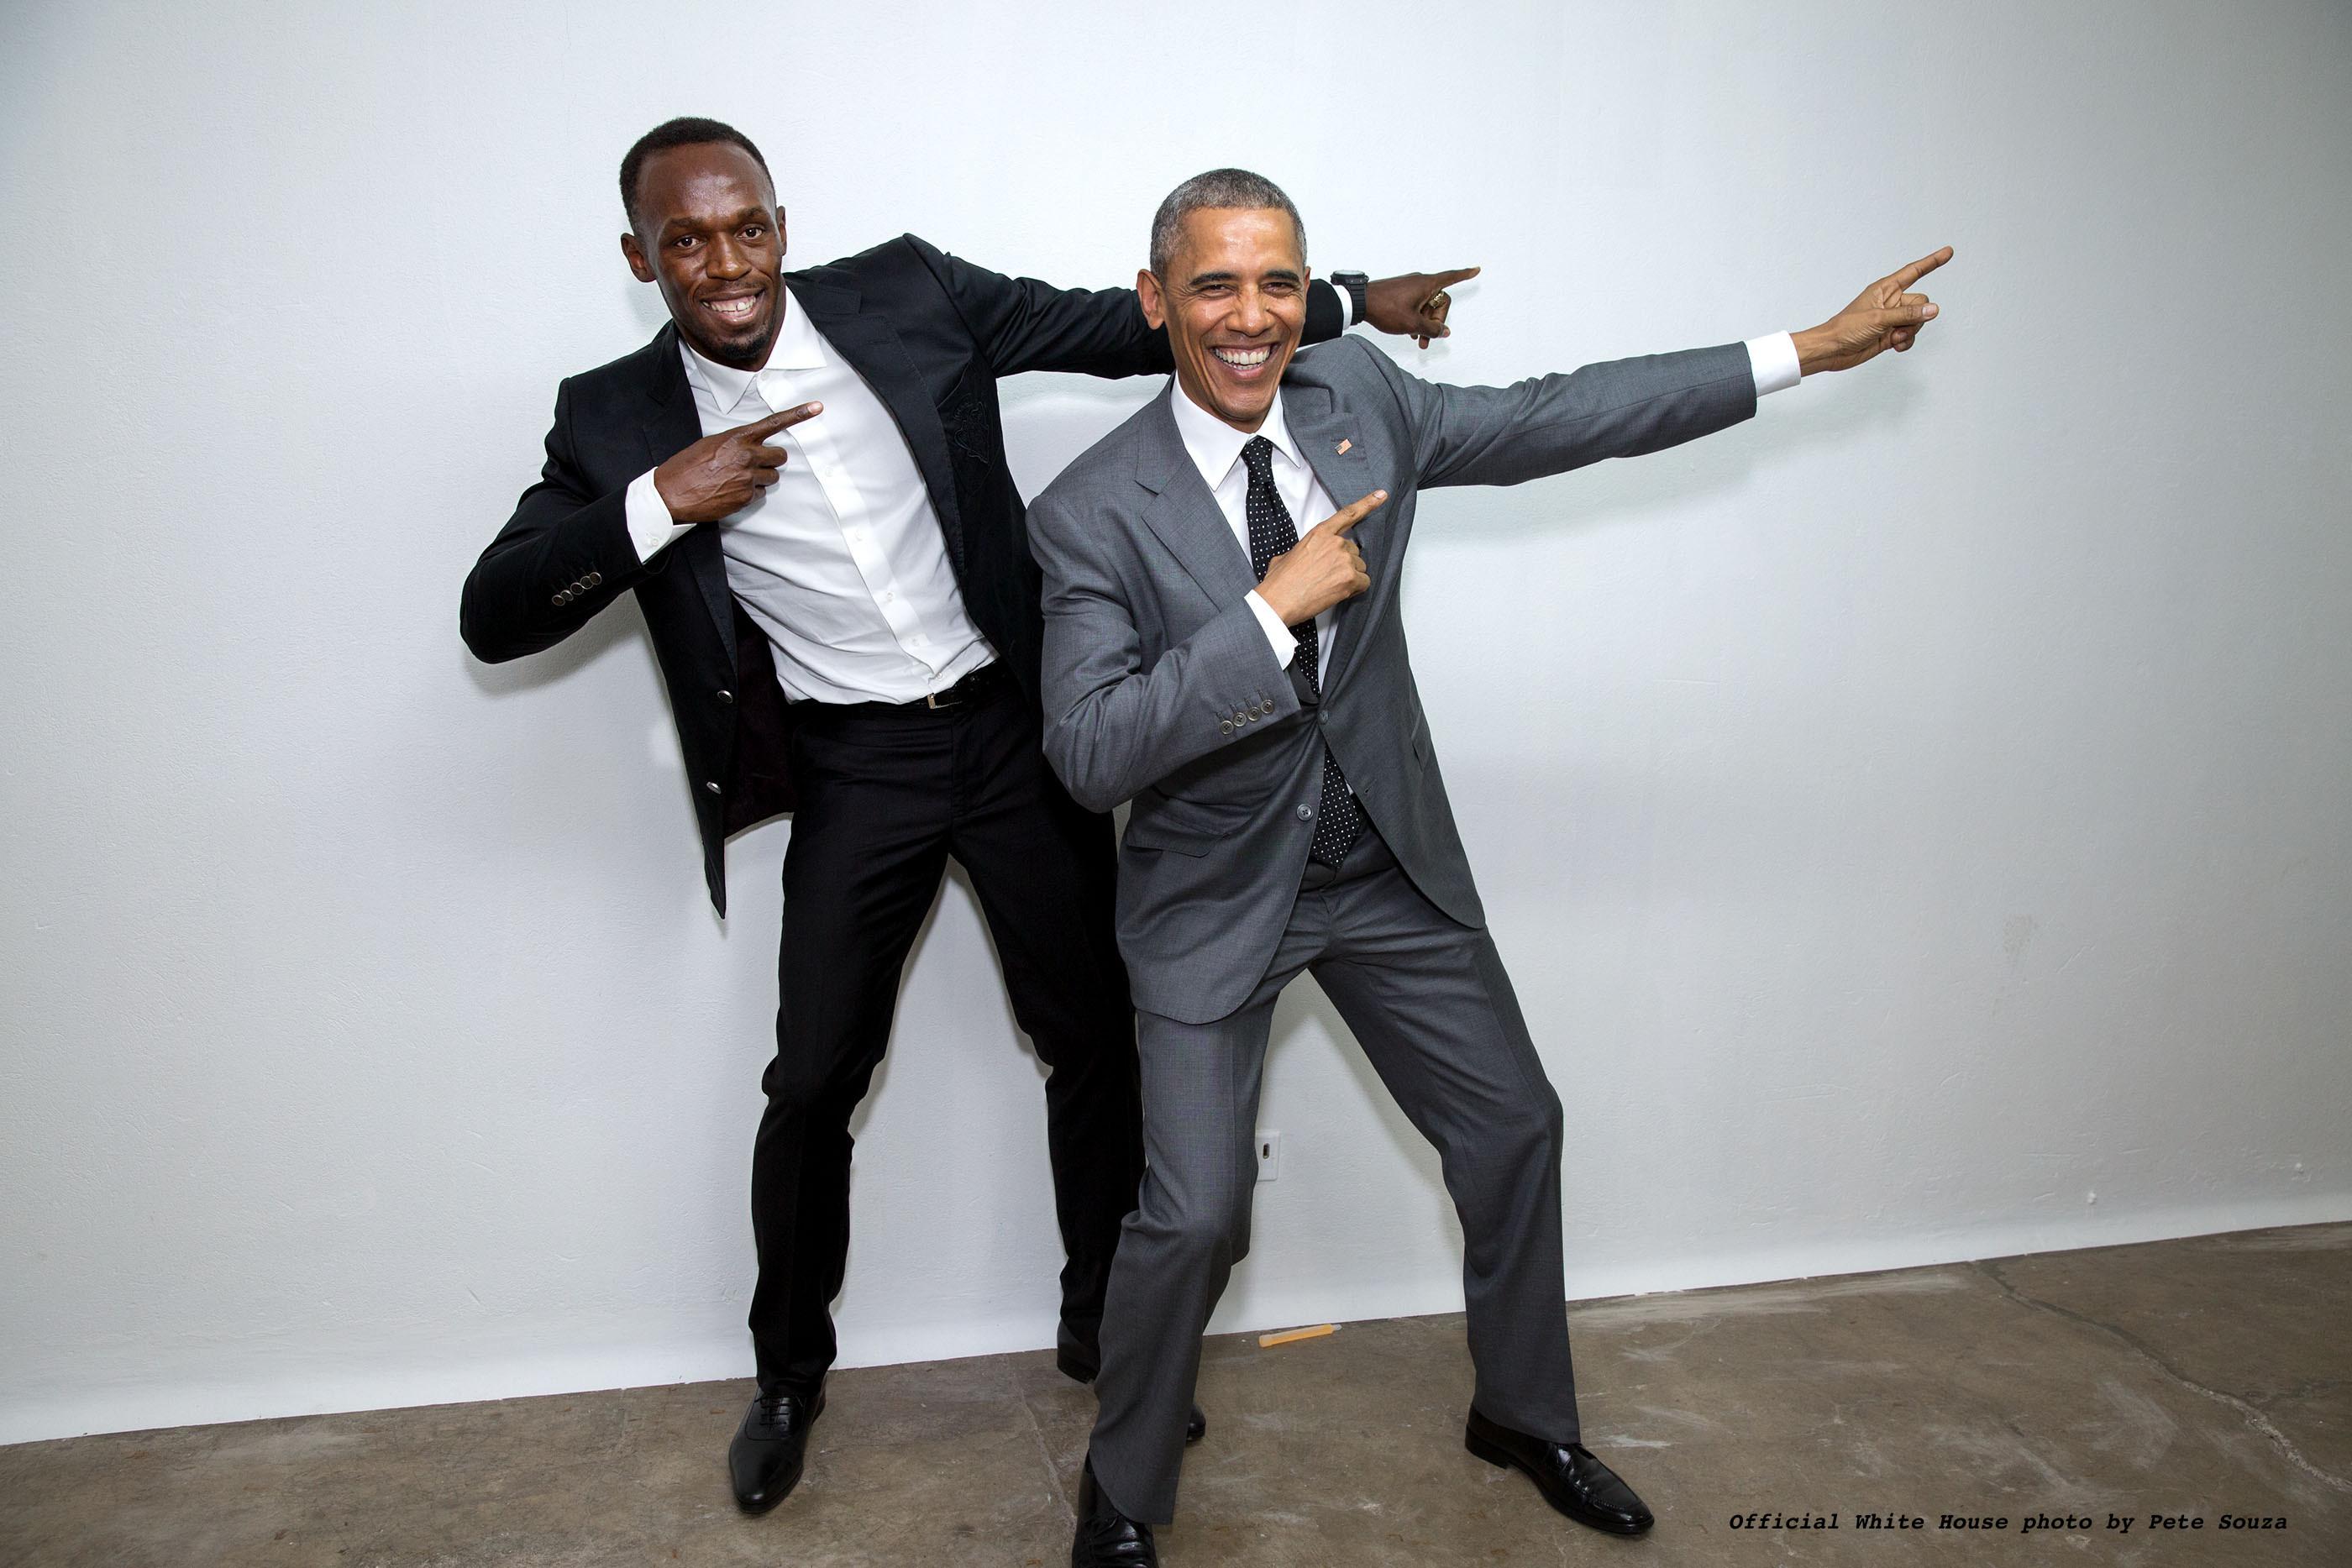 Usain meets President Obama